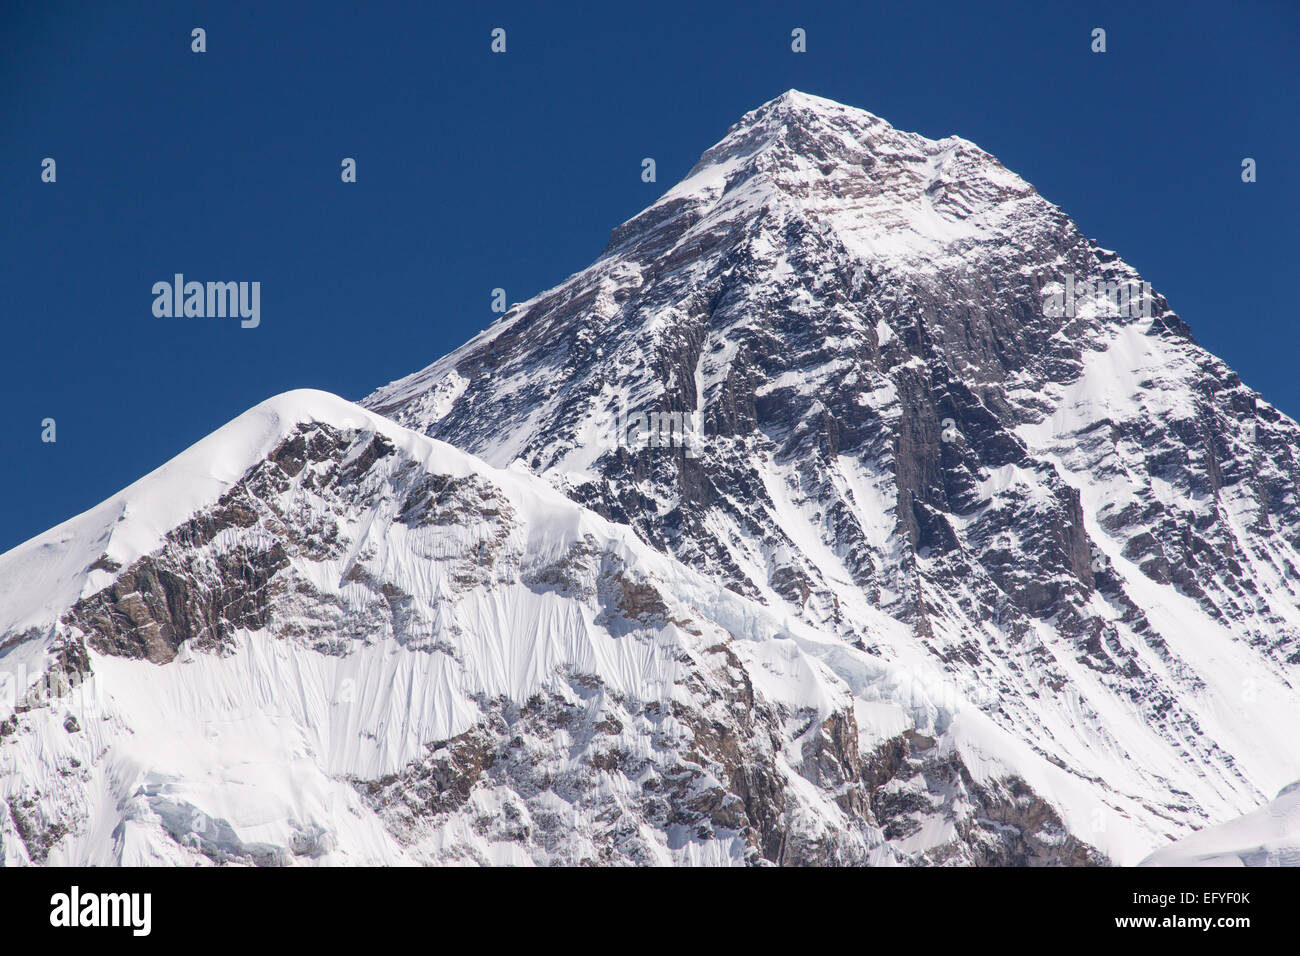 The peak of Mount Everest in Nepal - Stock Image